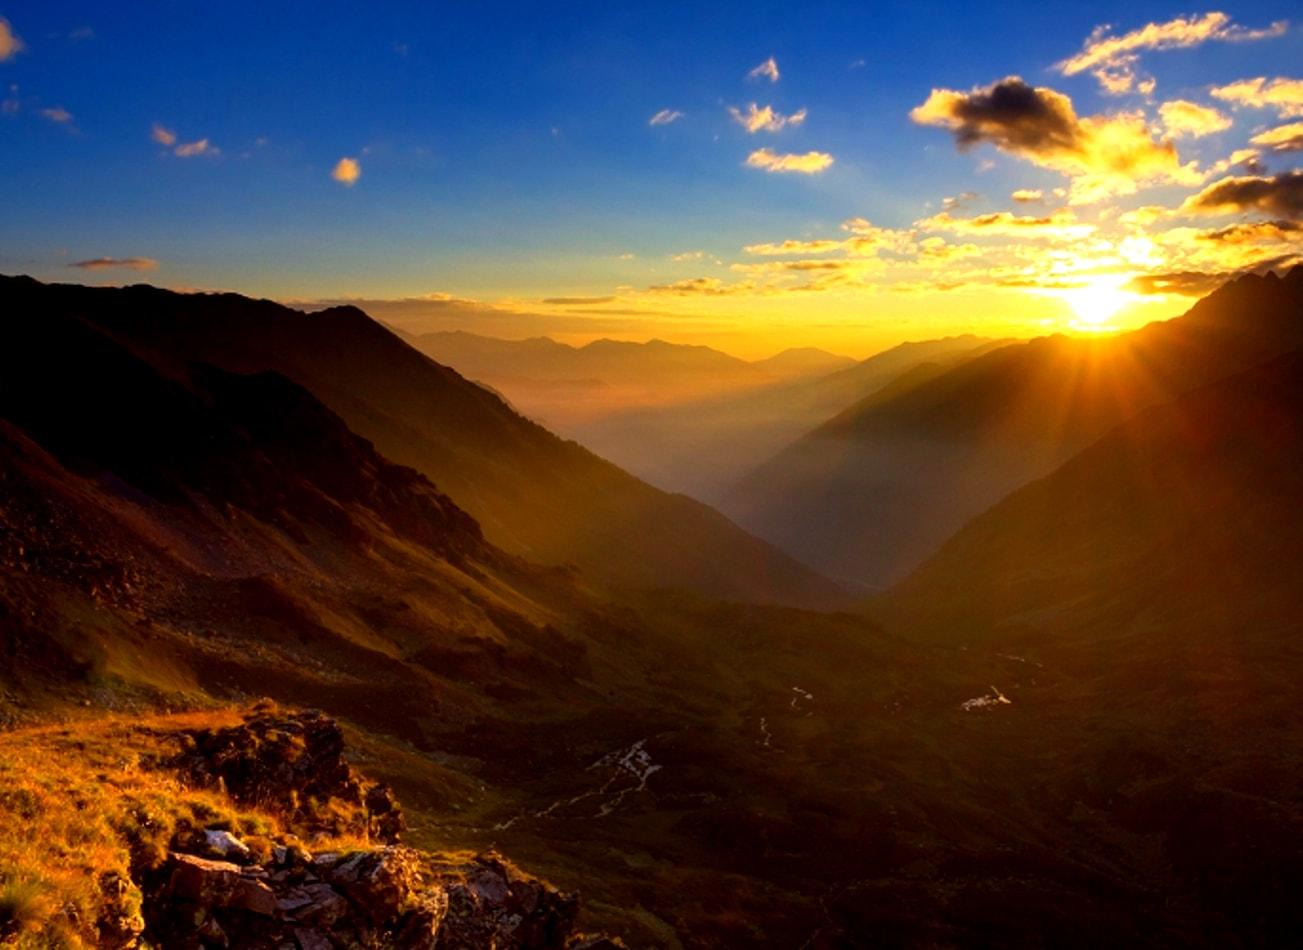 rando randonnée coucher de soleil annecy activites vimigo